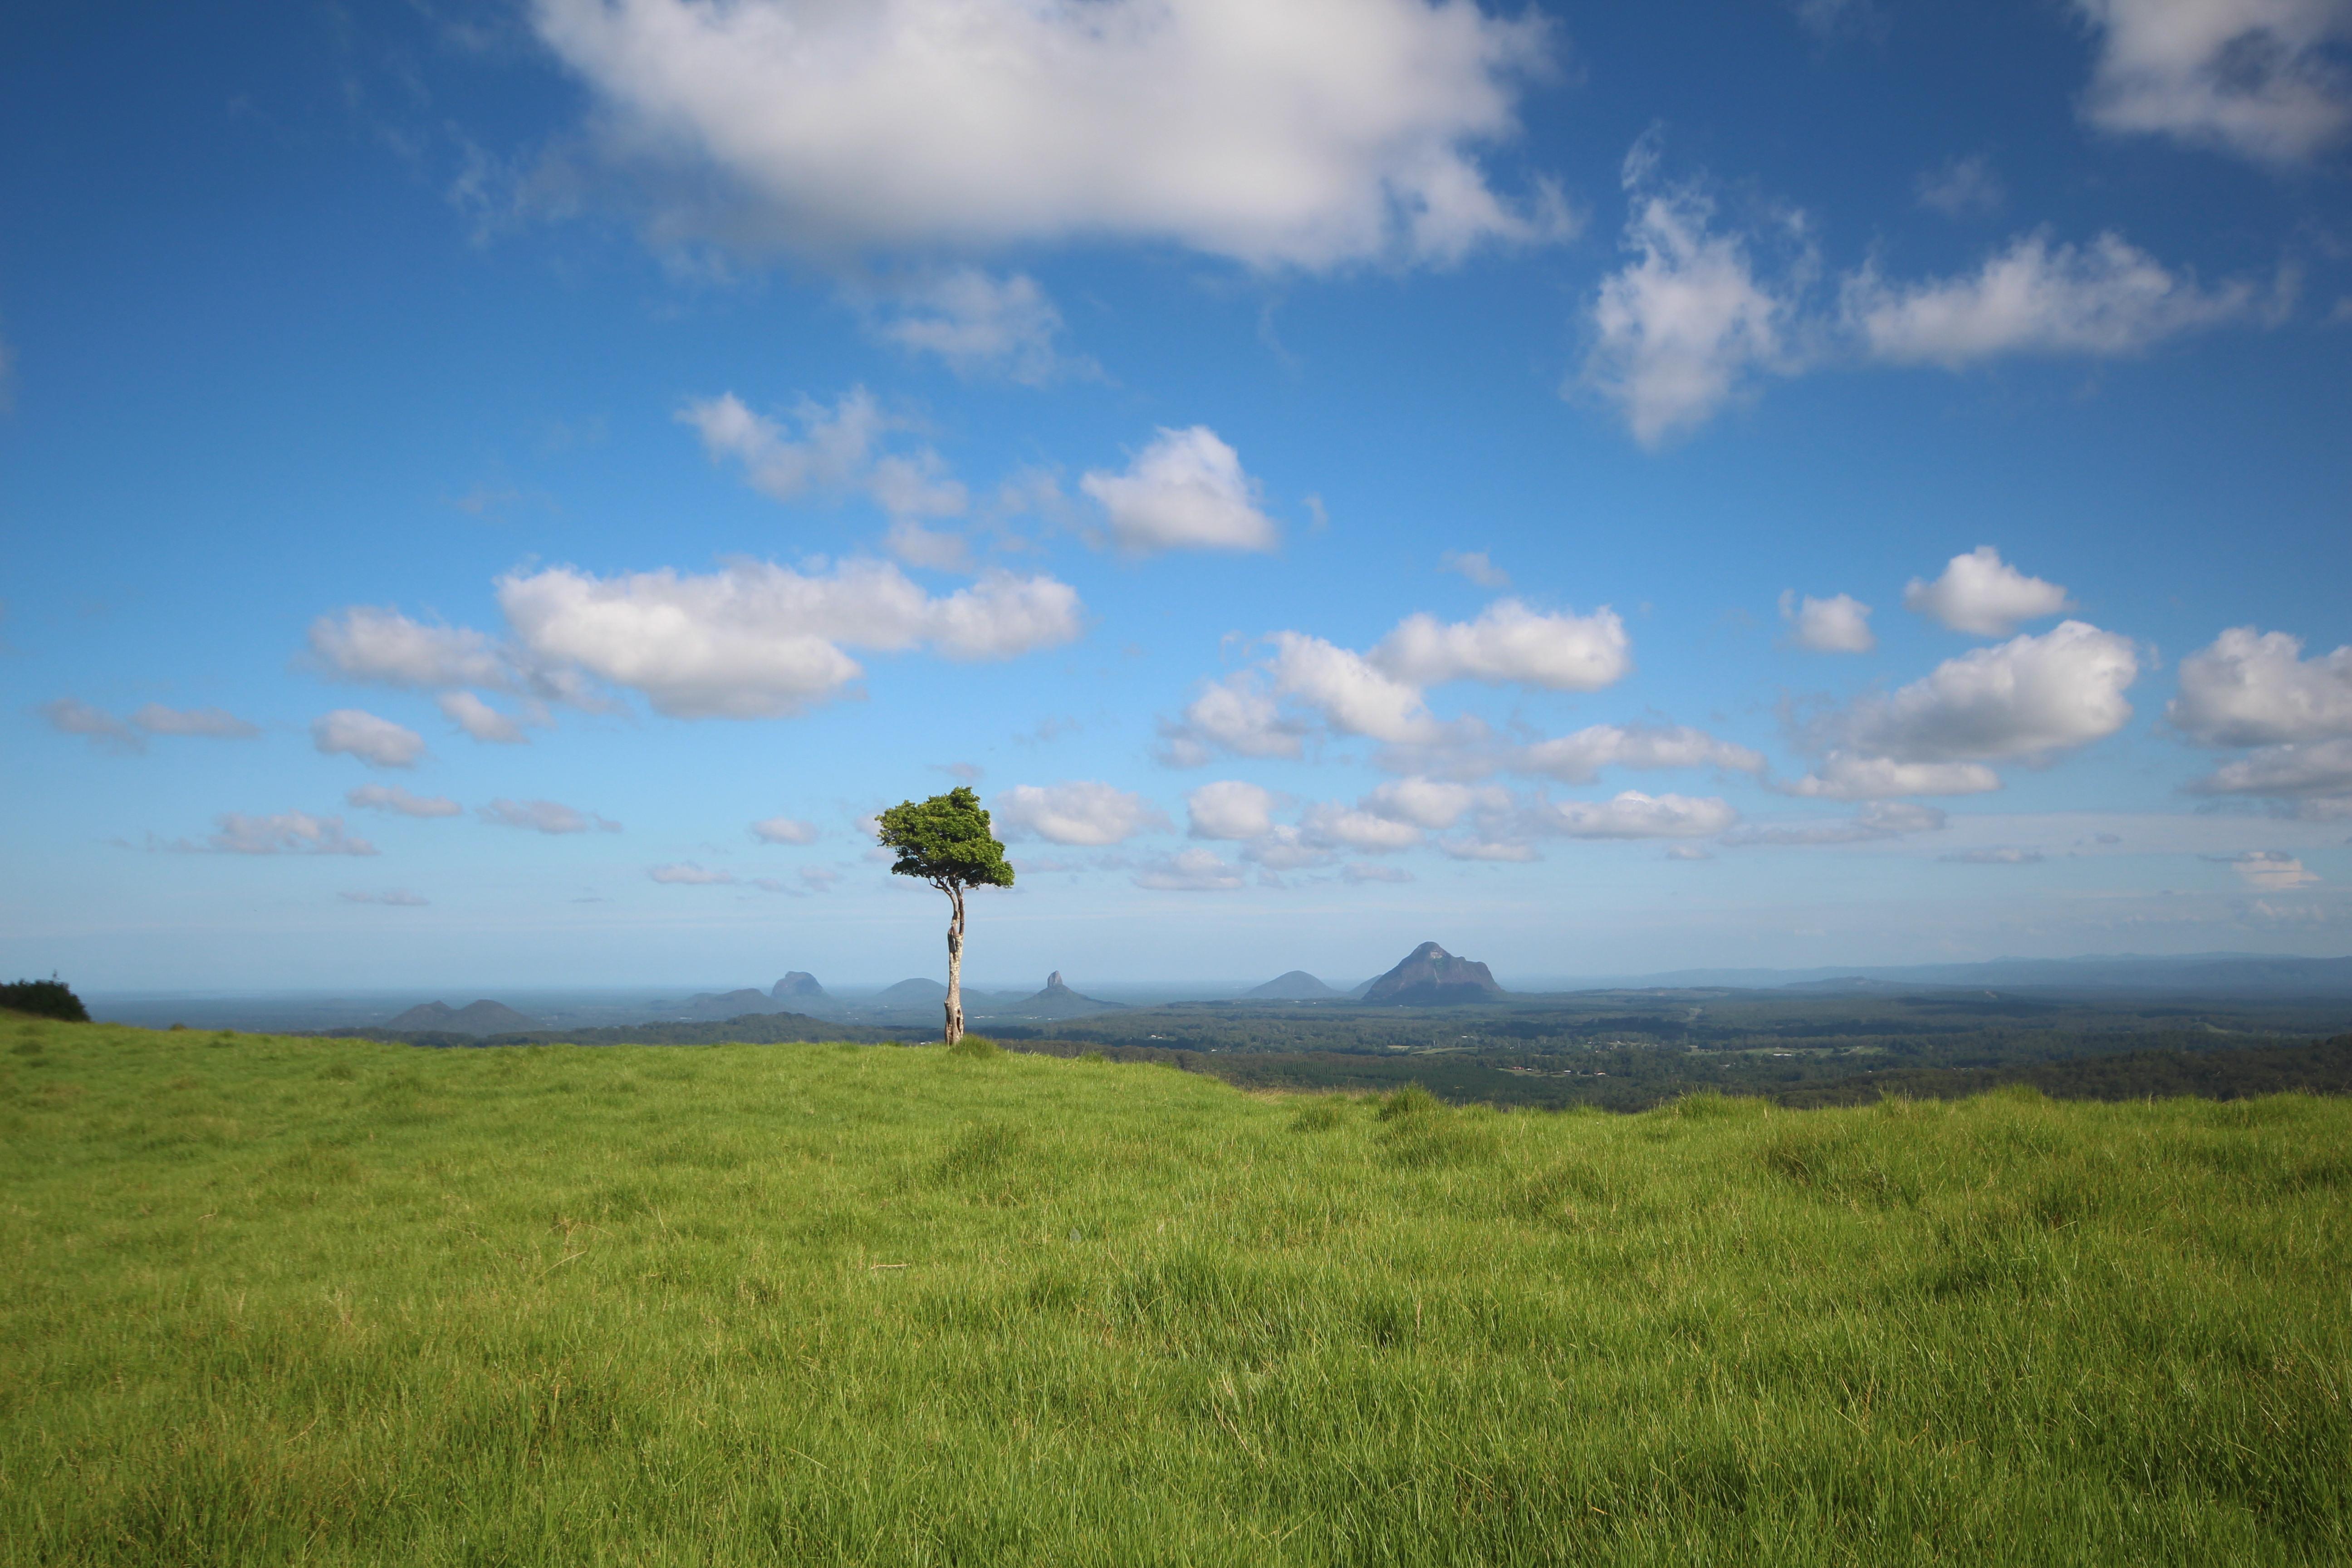 Free Images Tree Grassland Sky Ecosystem Prairie